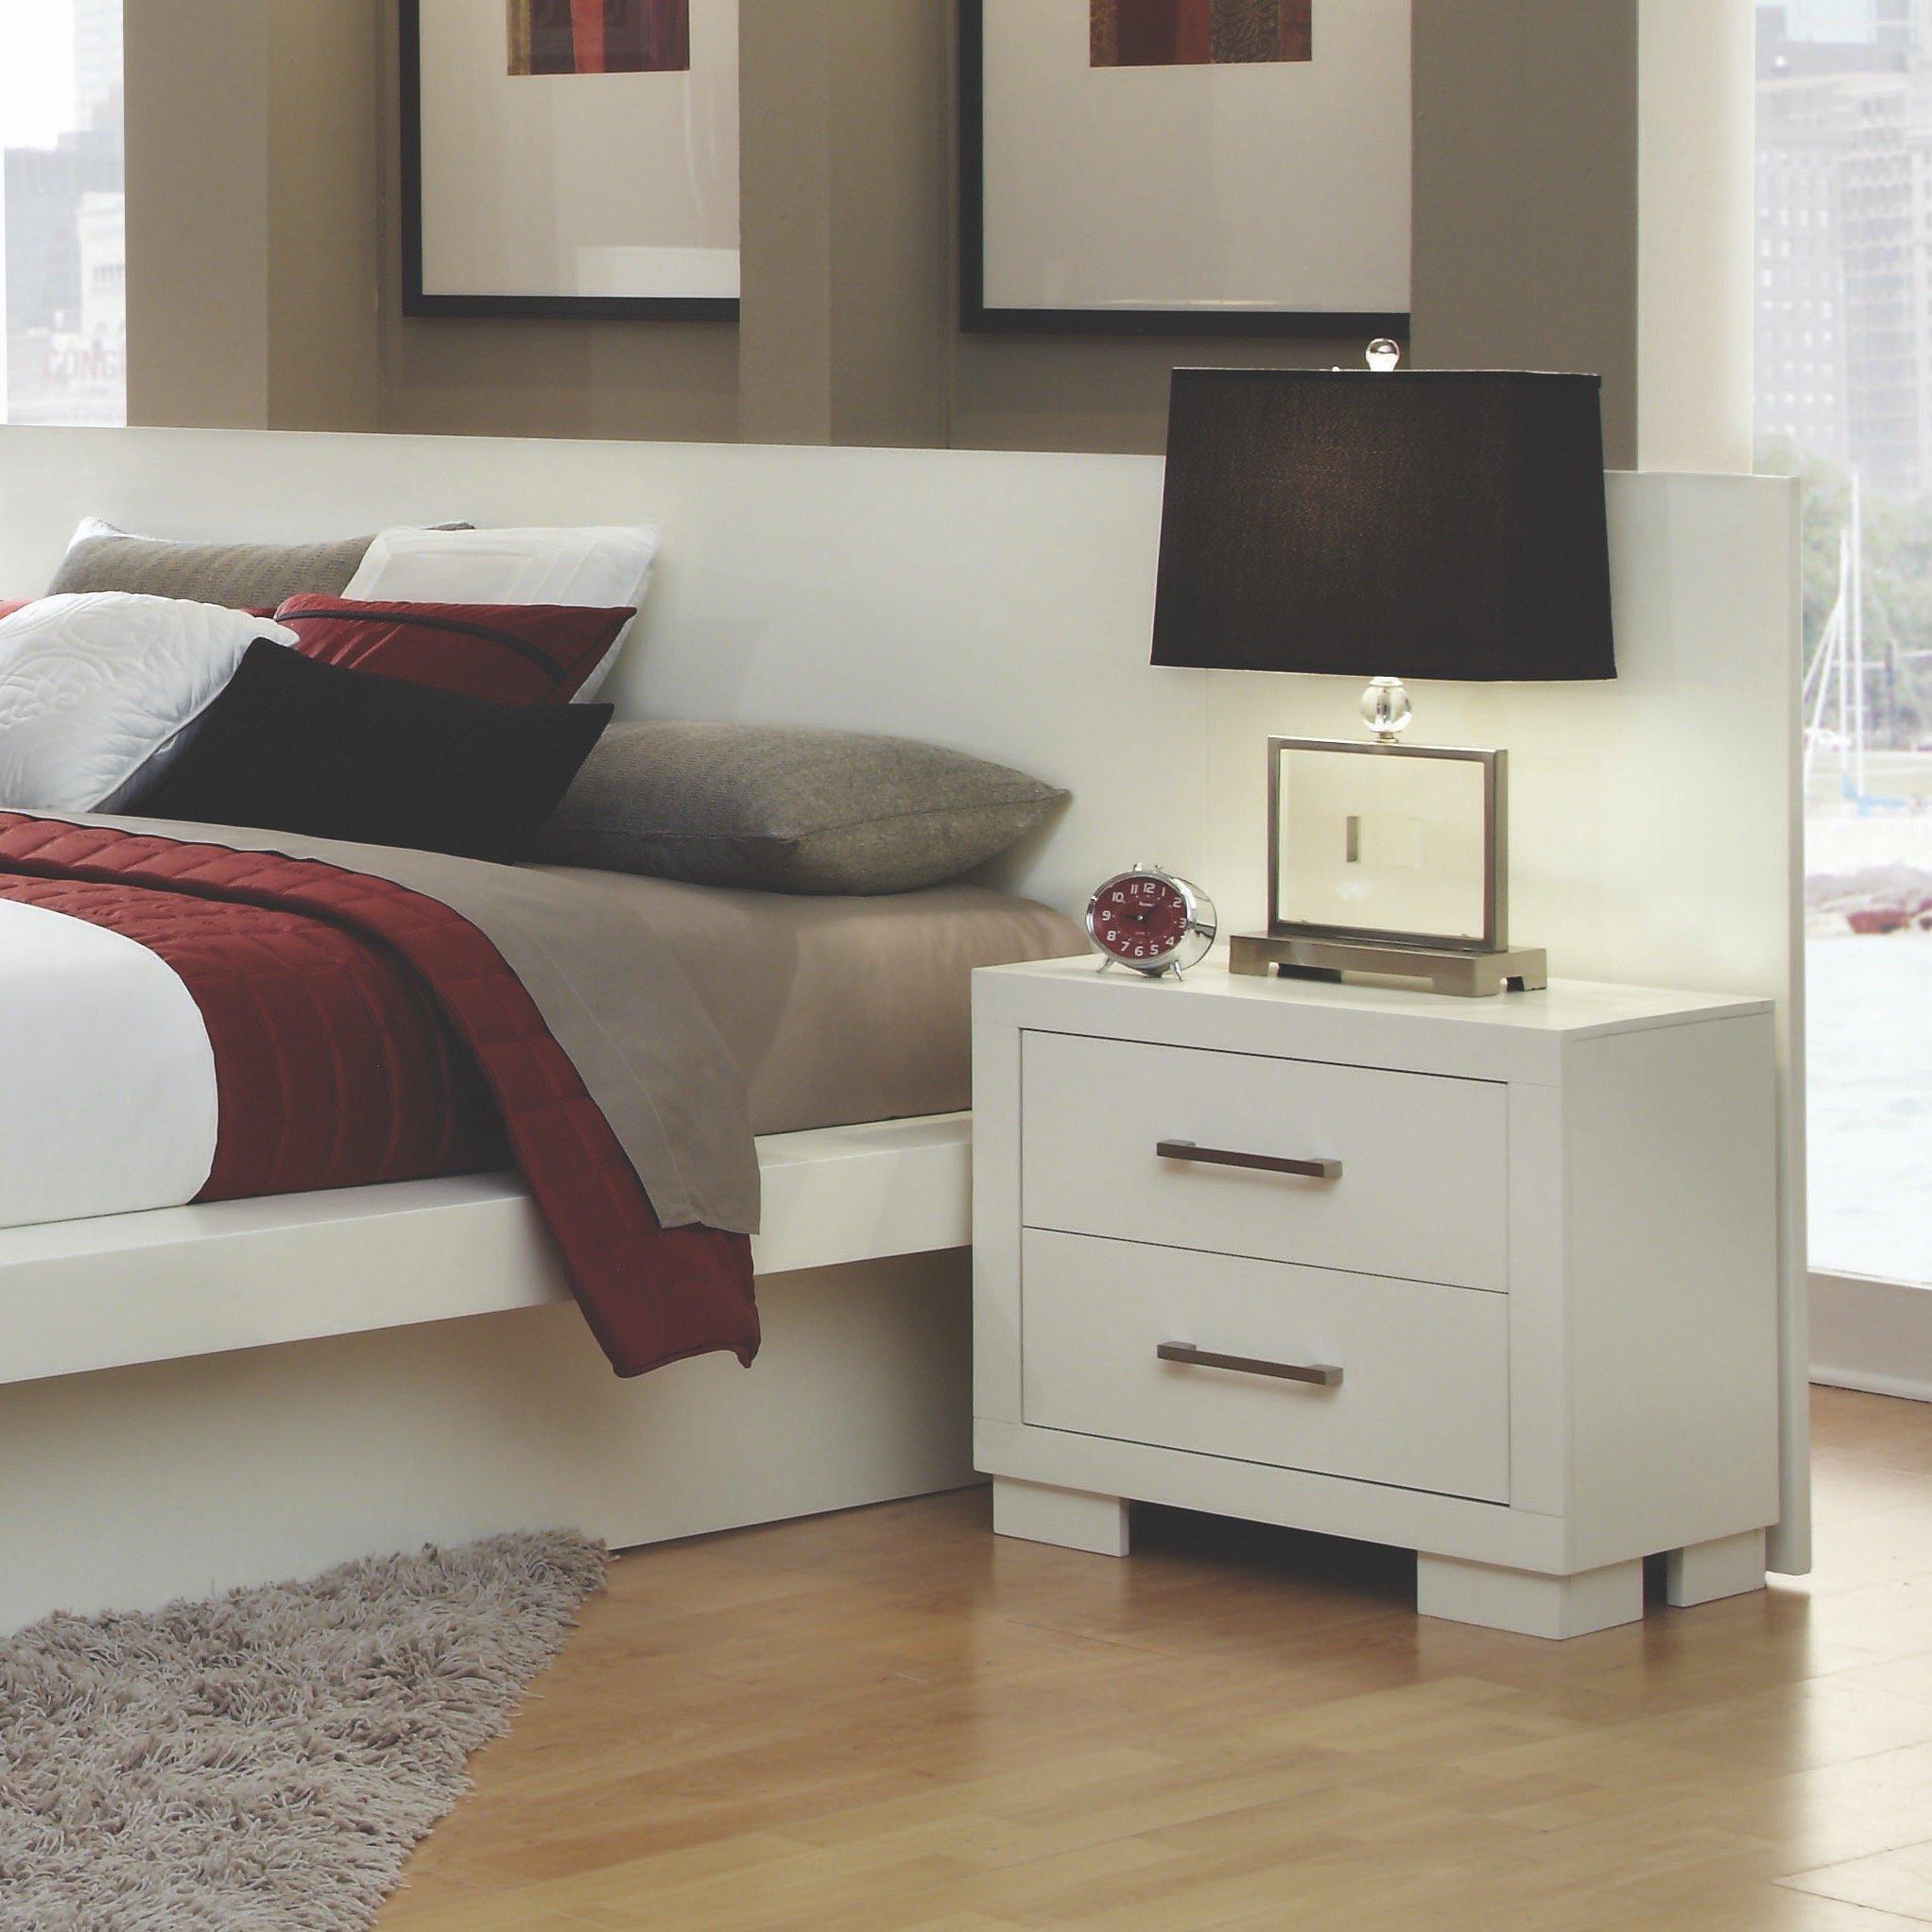 Coaster Home Furnishings 203090KW Contemporary Nightstand, White